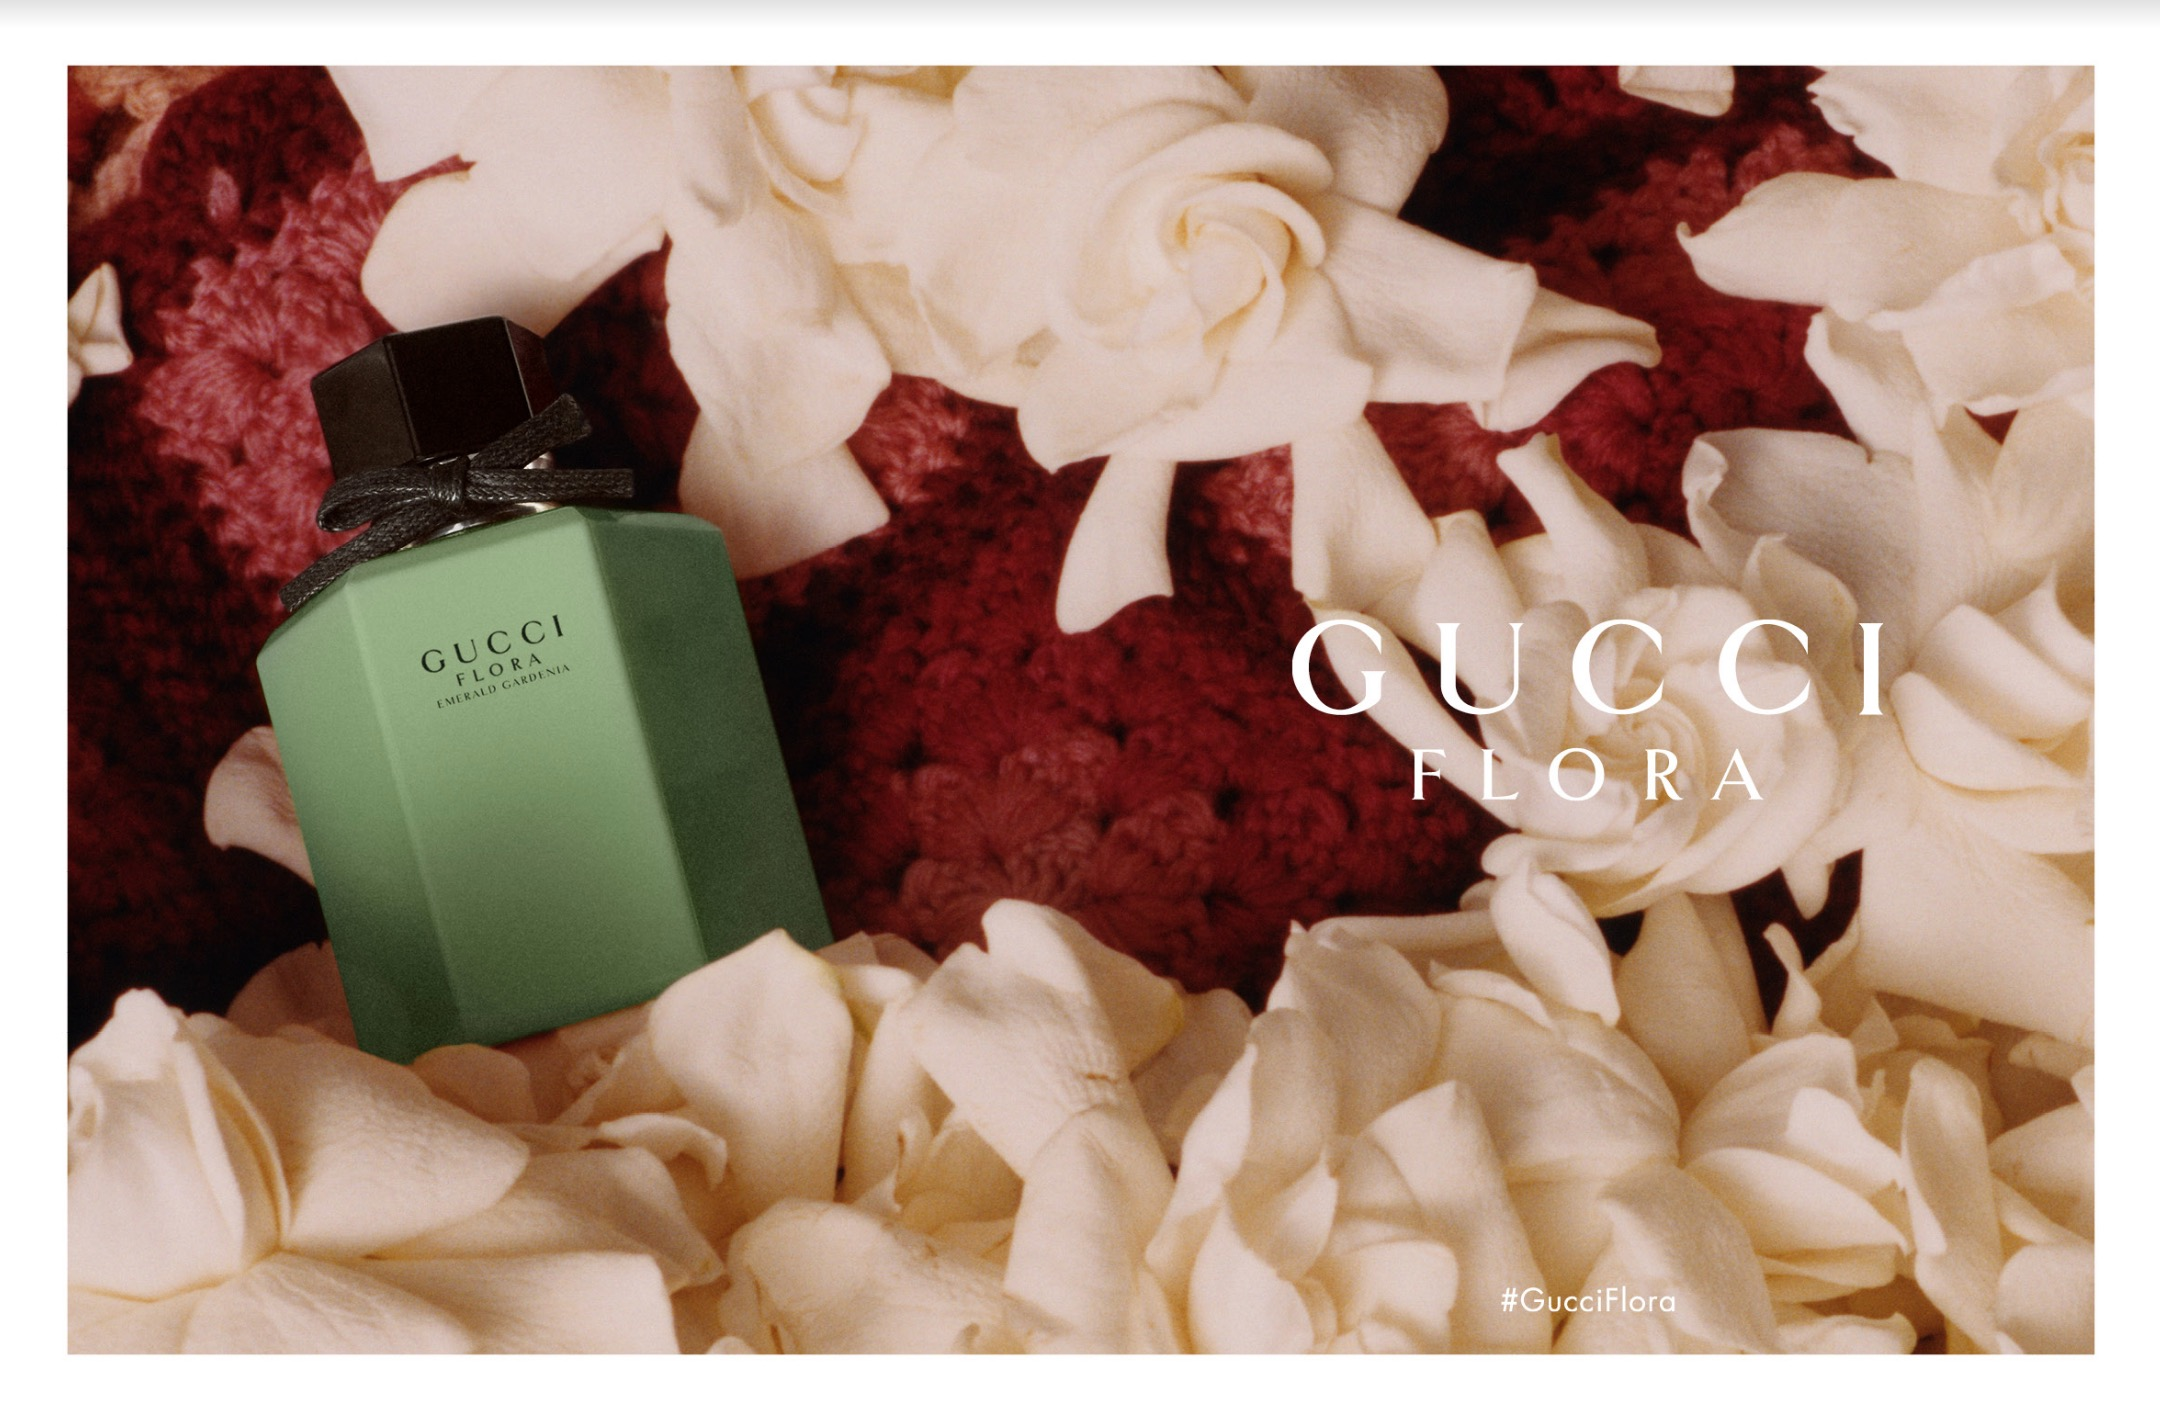 GUCCI Flora Emerald Gardenia 華麗梔子花翠綠限量版